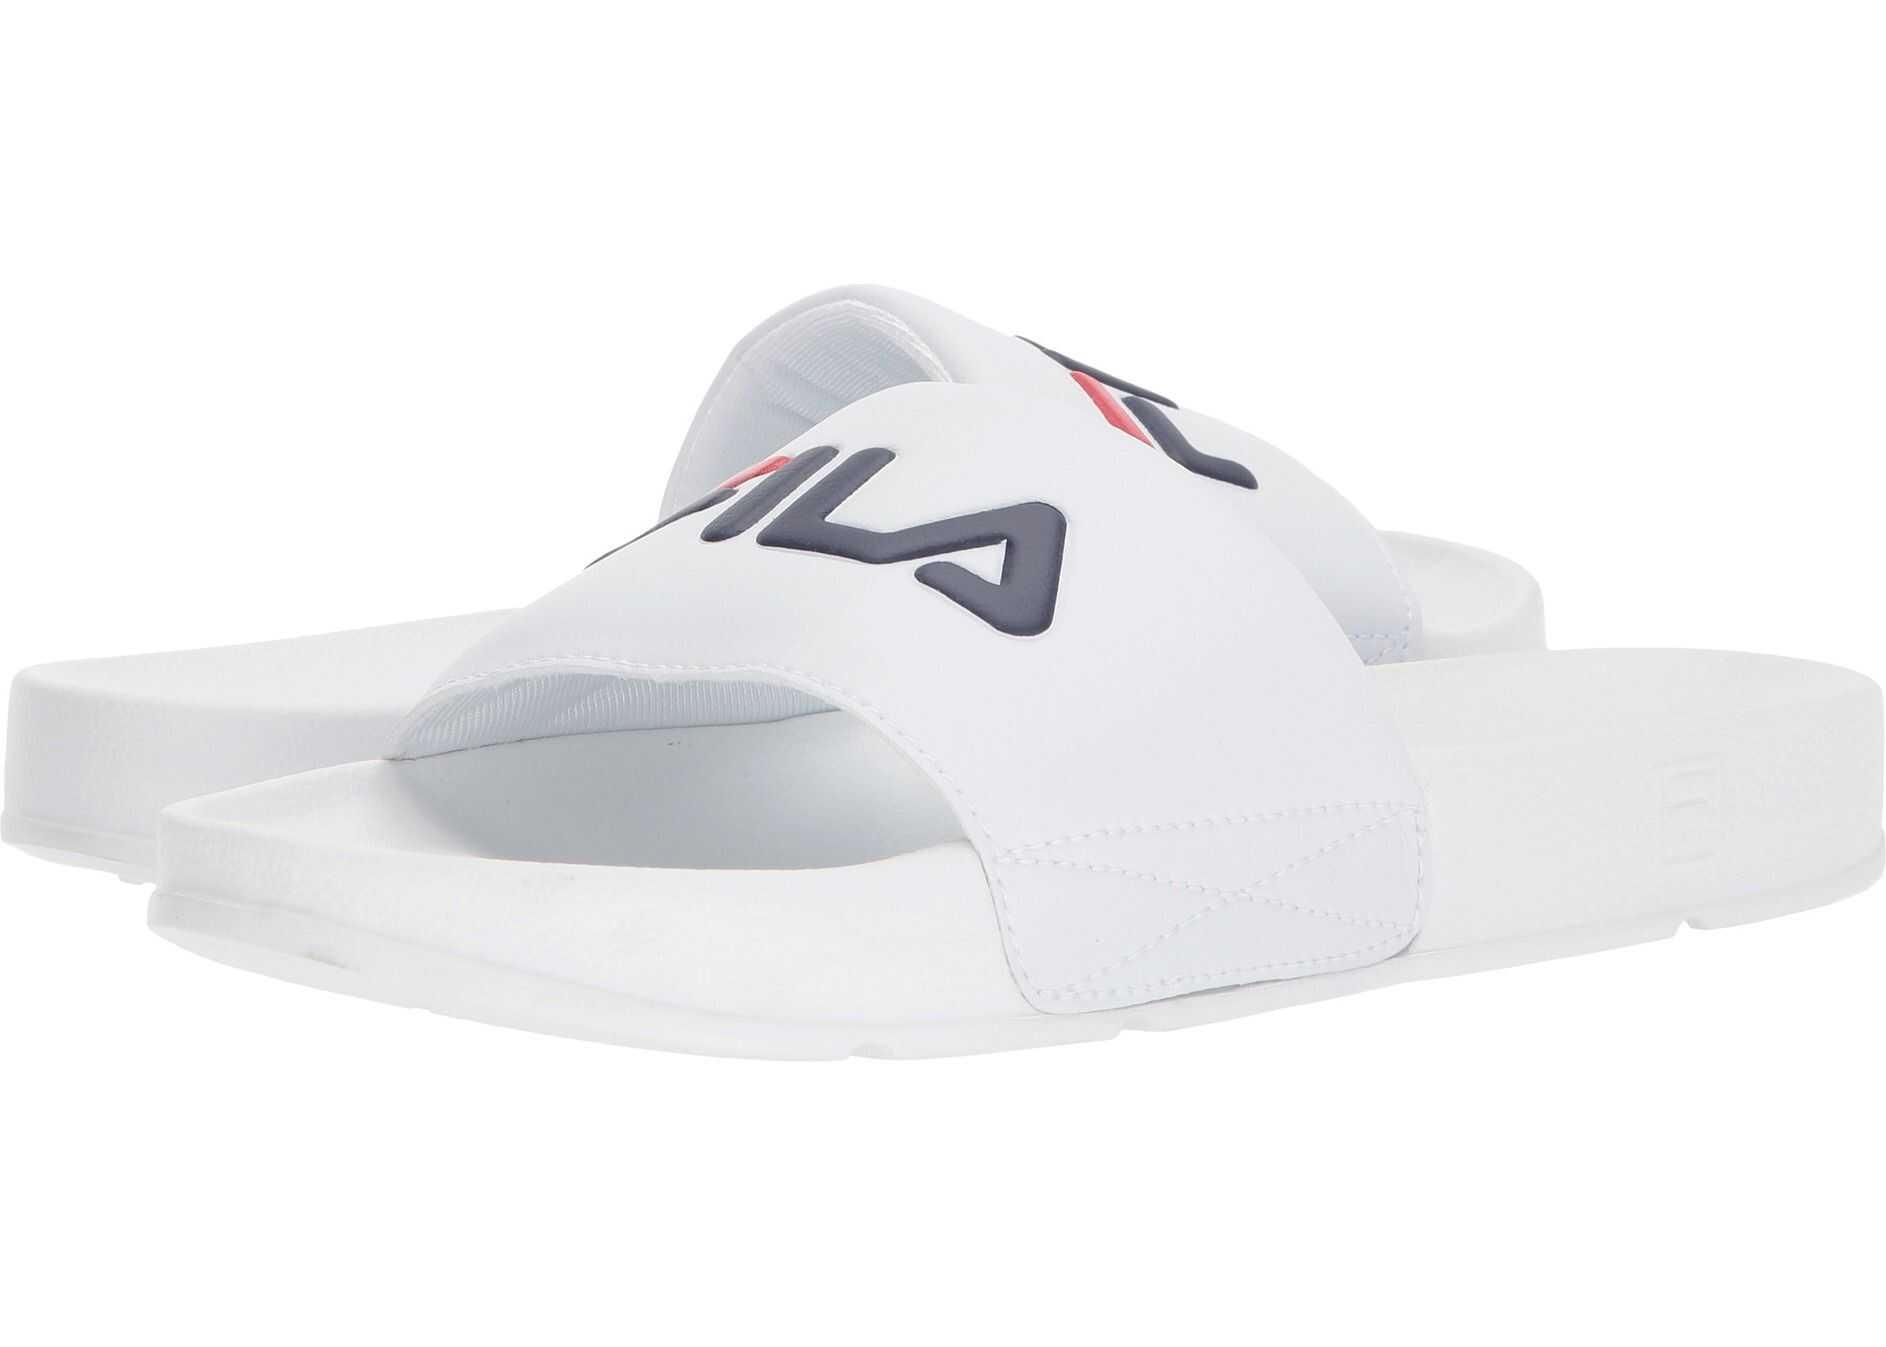 Fila Drifter White/Fila Navy/Fila Red